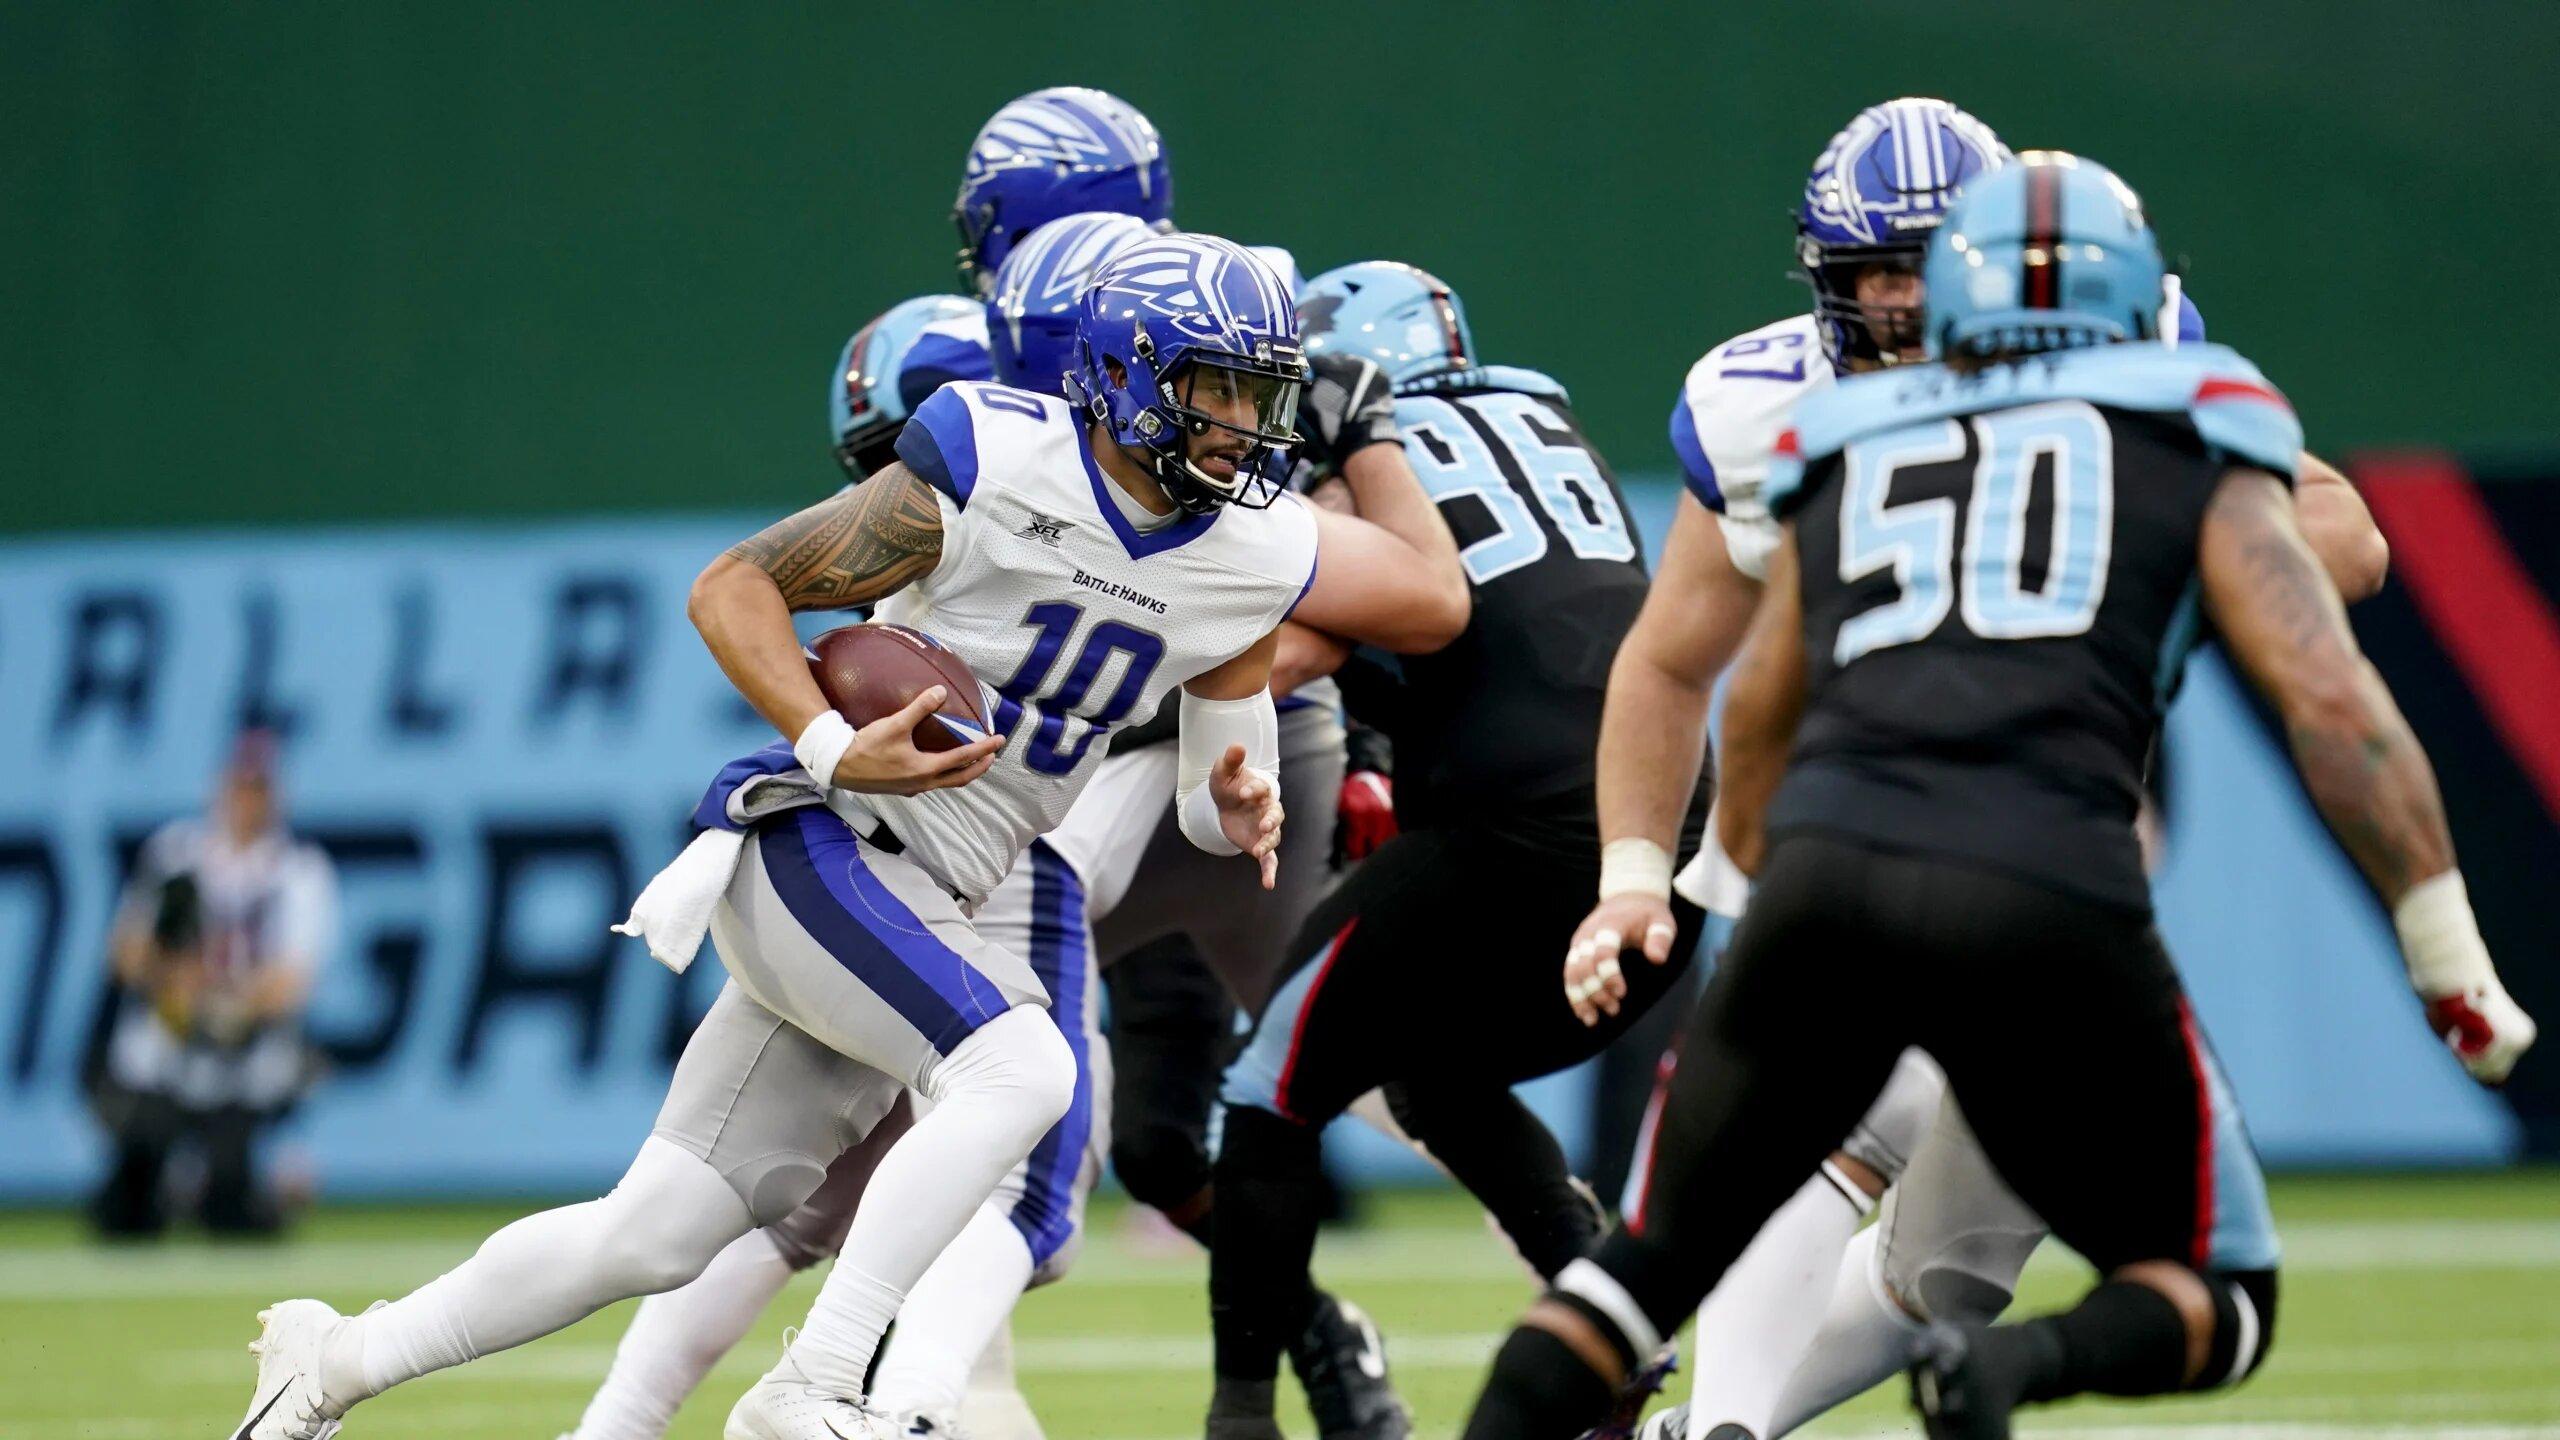 St. Louis BattleHawks quarterback Jordan Ta'amu rushes the ball against the Dallas Renegades